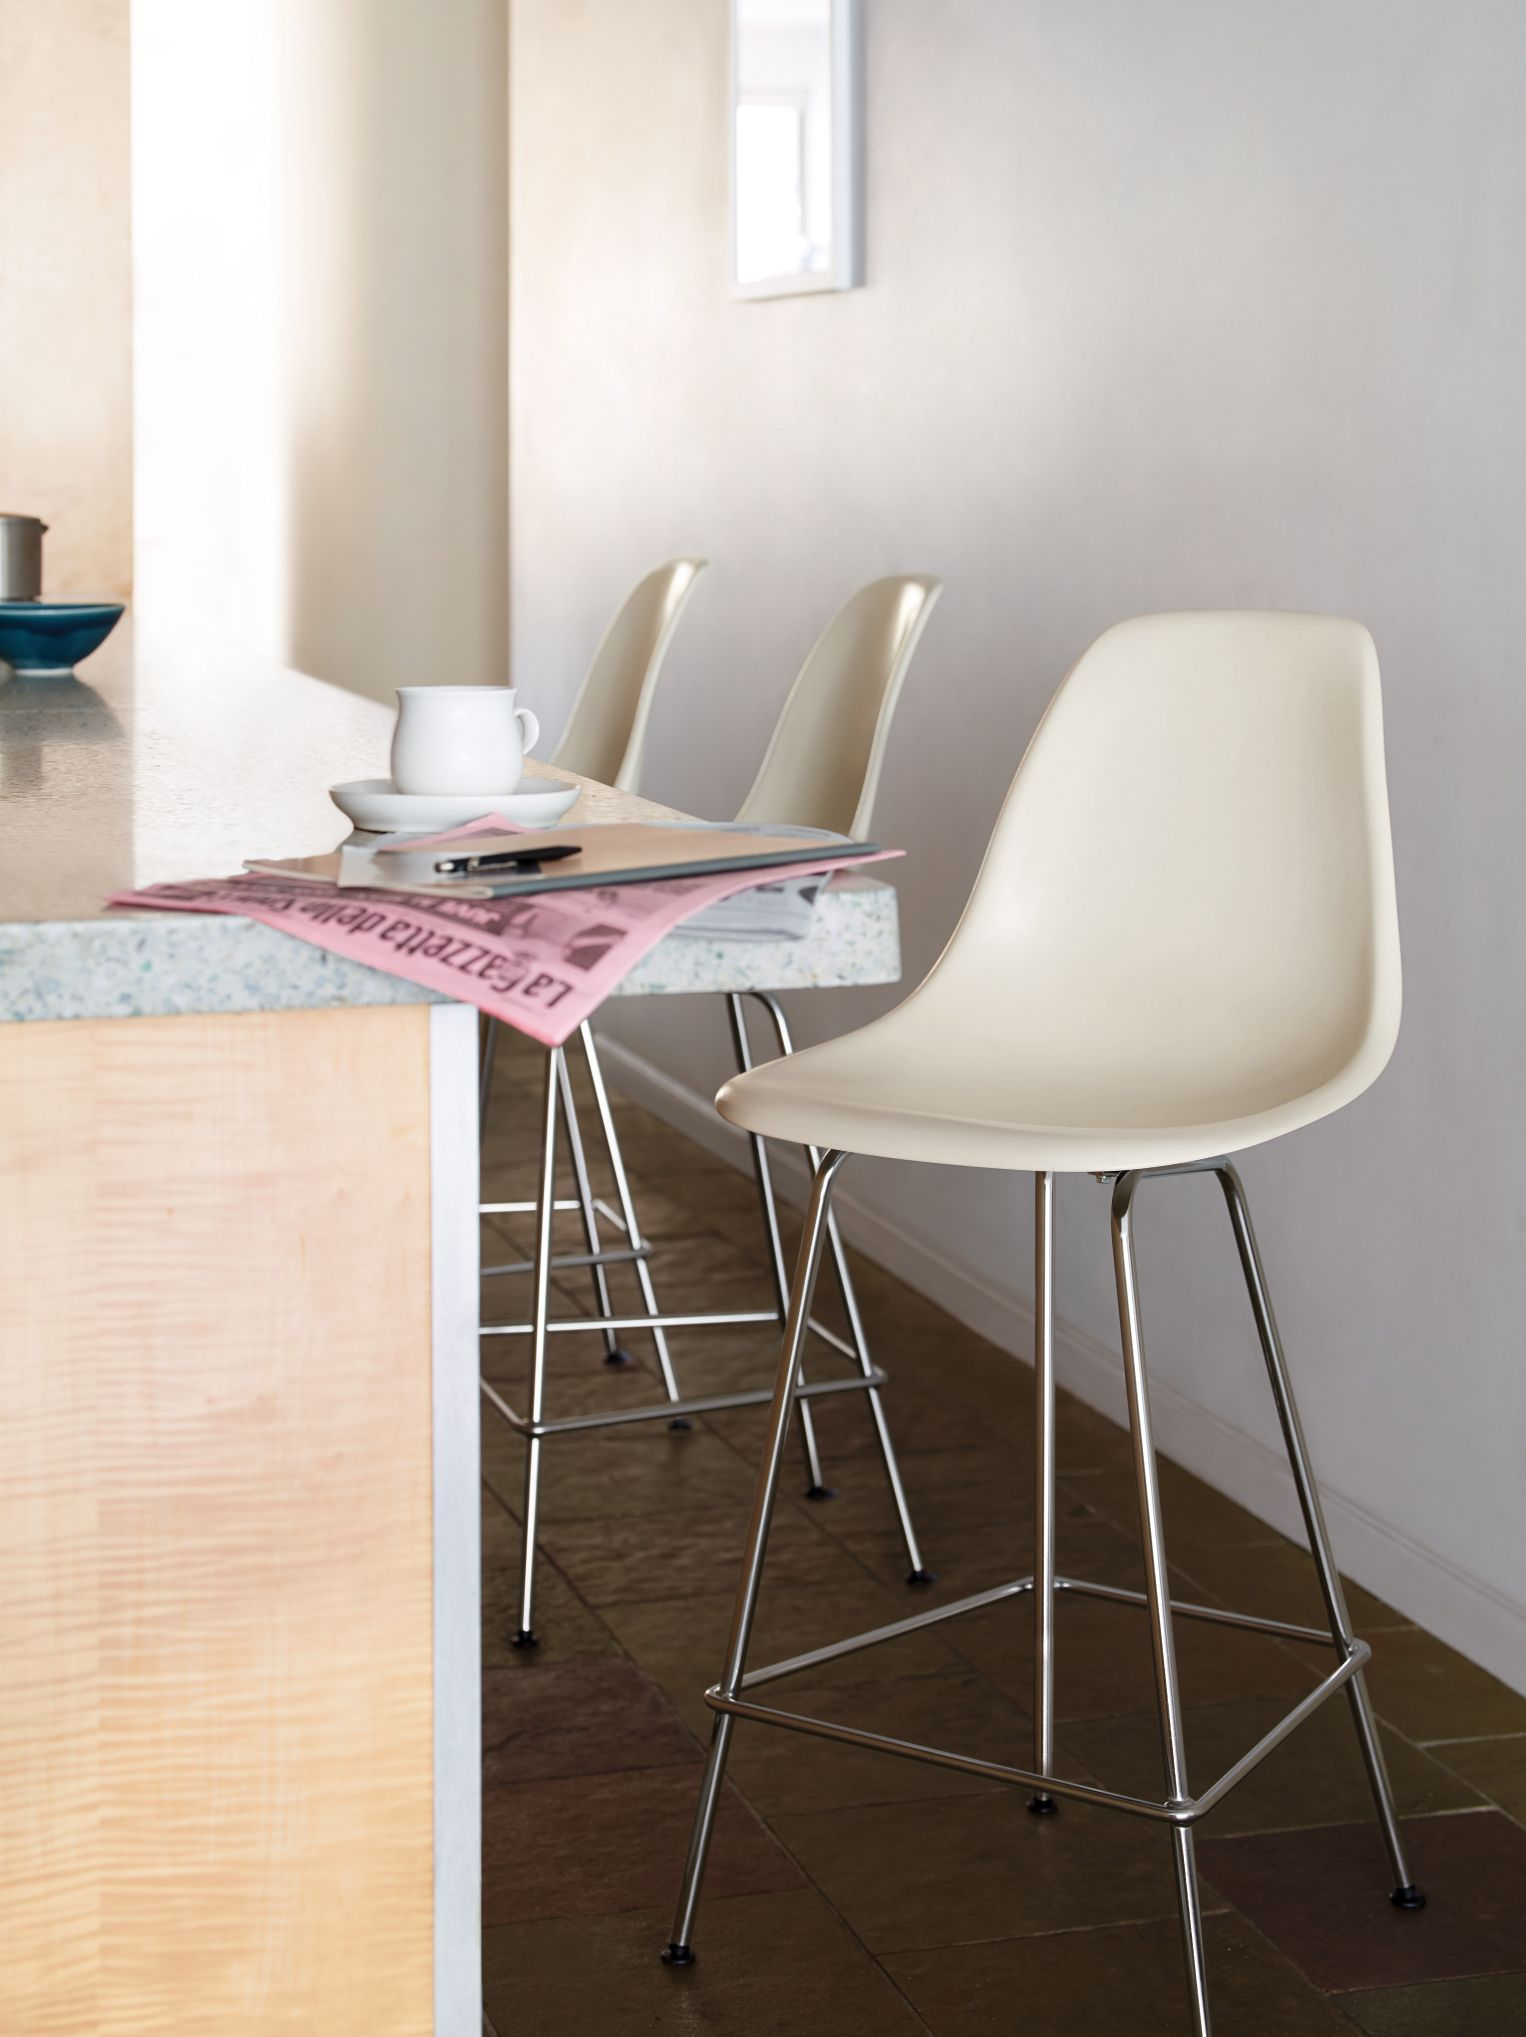 Eames Molded Fiberglass Counter Stool Dfhcx Eames Chairs